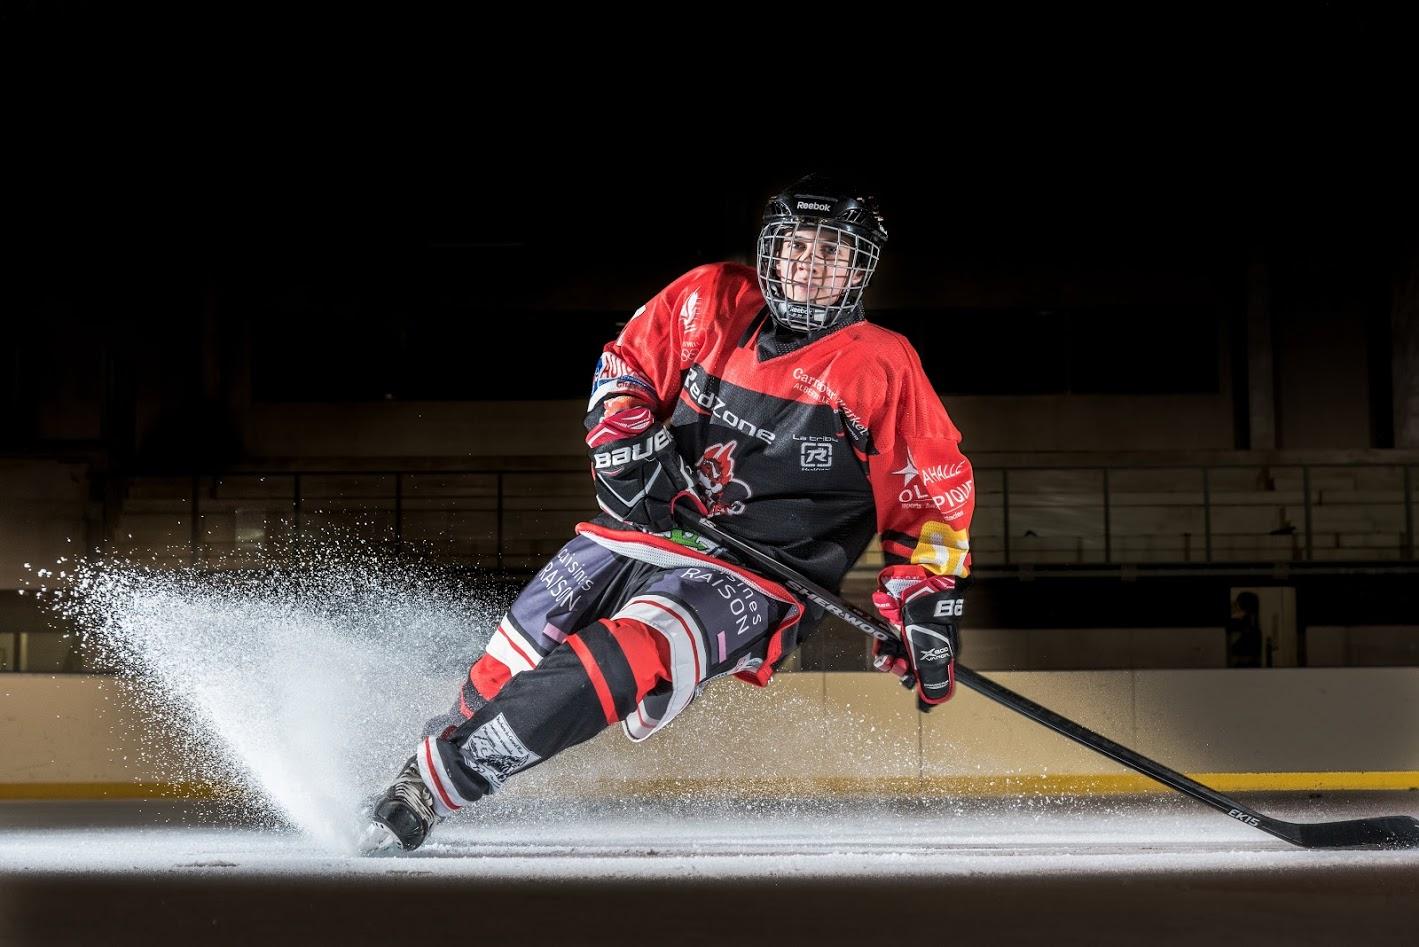 hockeyeur vincent